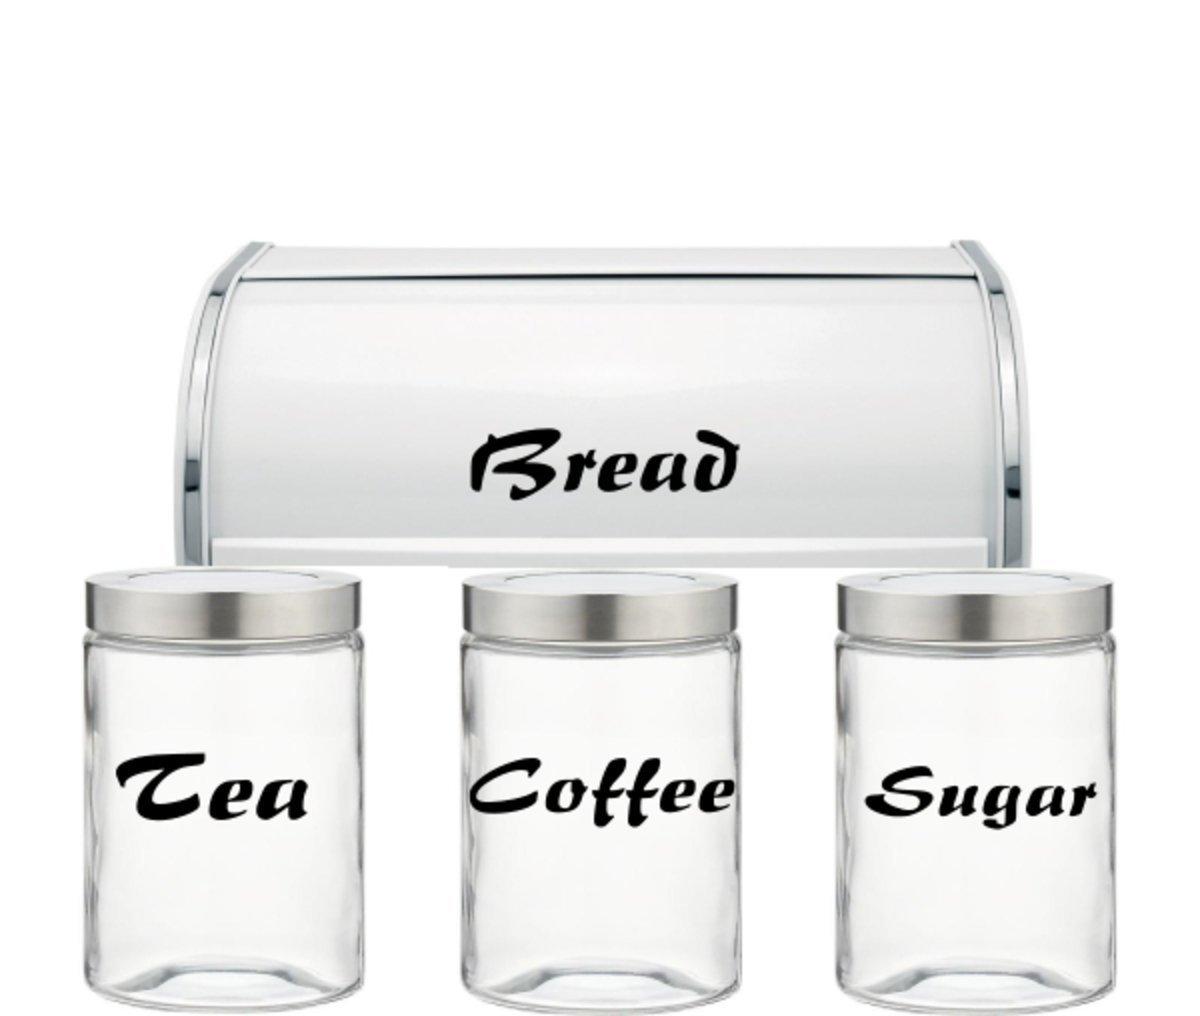 Tea, Coffee, Sugar, Bread - Jar Vinyl Decals Stickers Kitchen - Set of 4 Decals - (JARS & BREAD BIN NOT INCLUDED!!) CCG EXPSFD012604